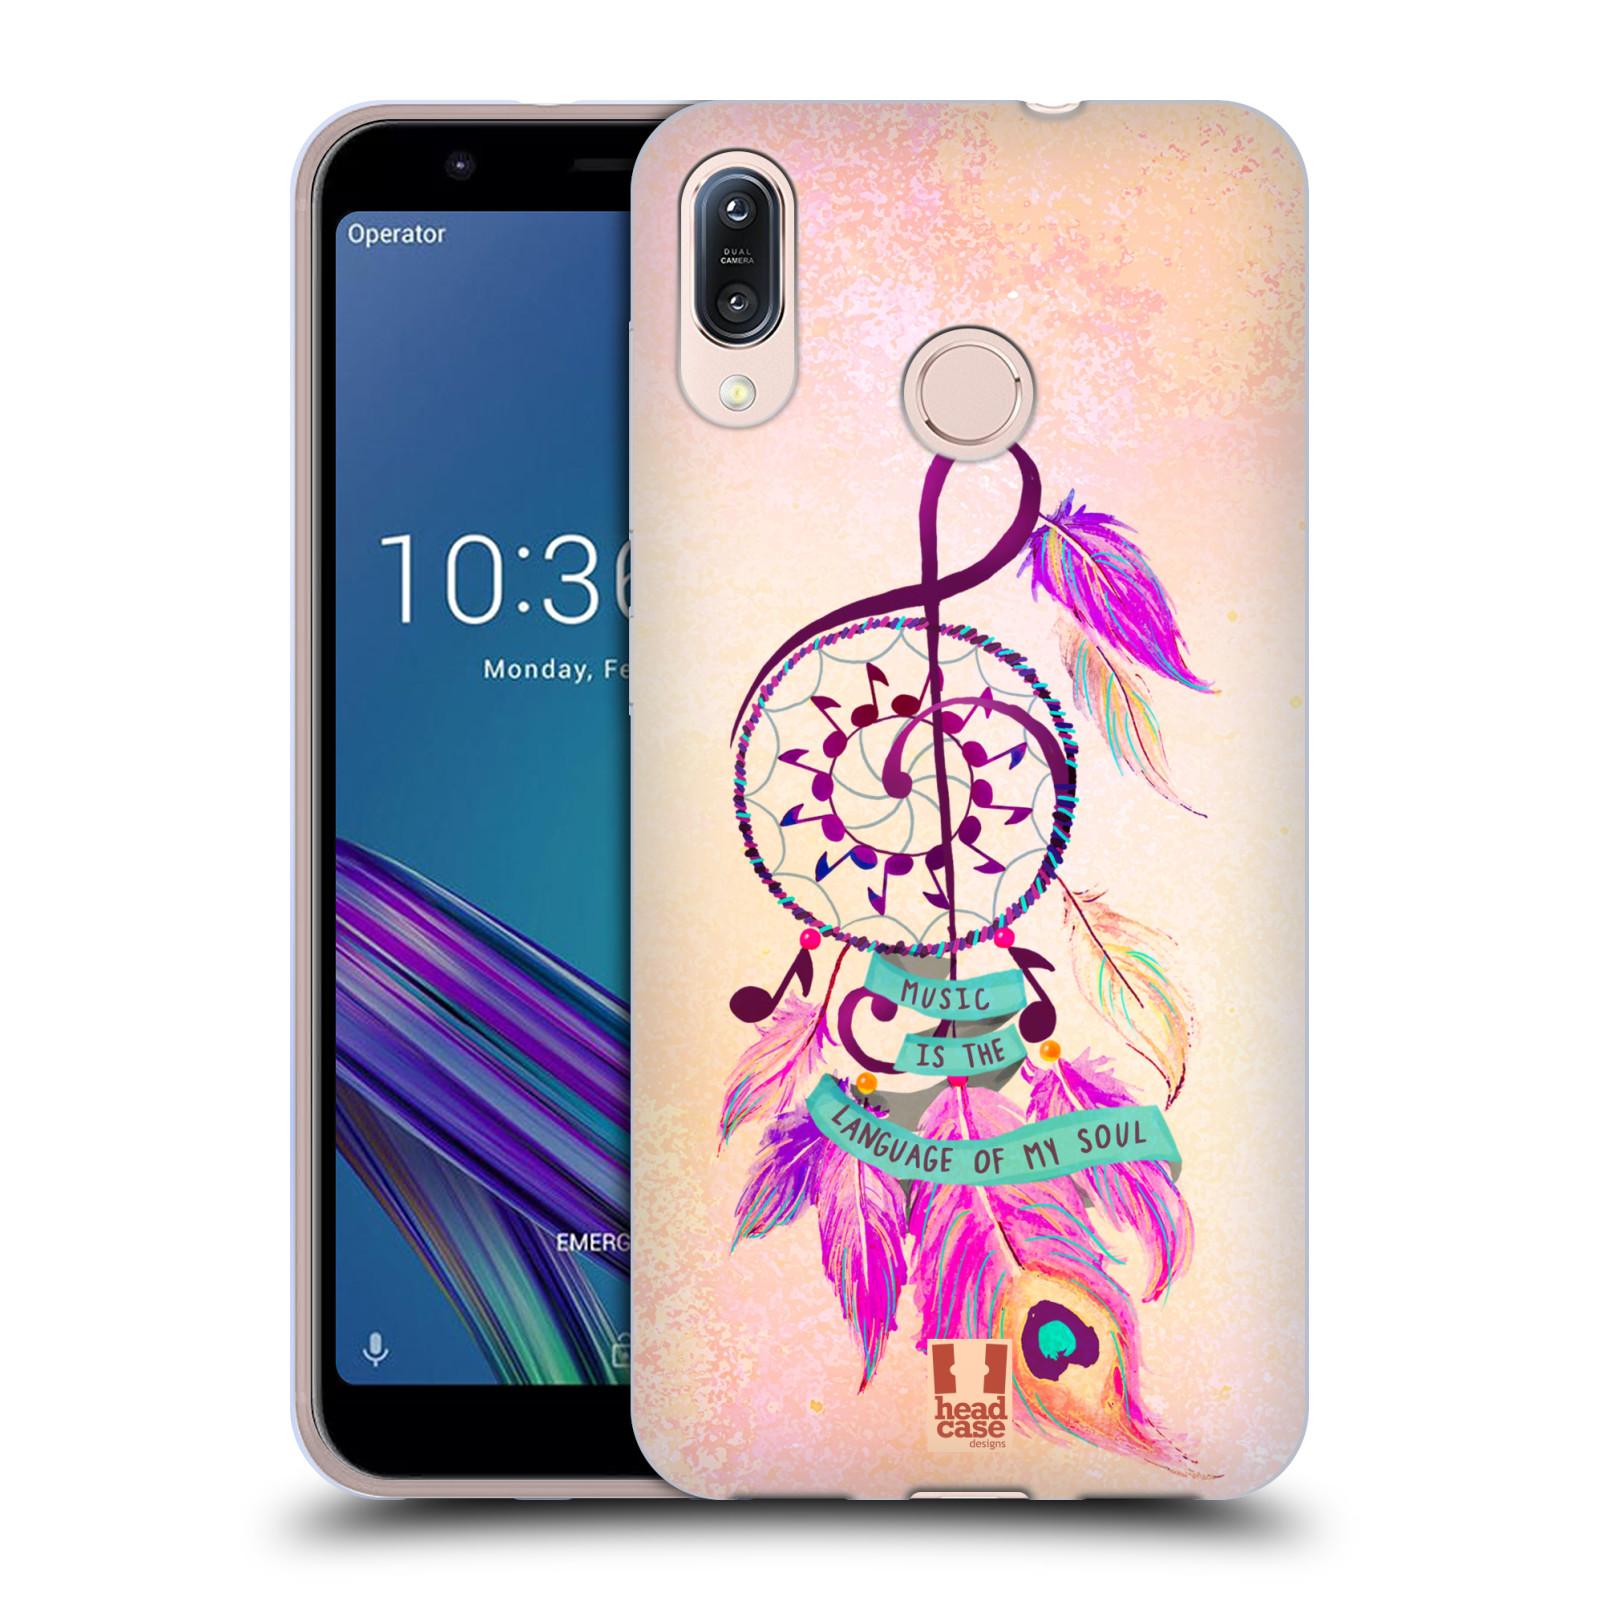 Silikonové pouzdro na mobil Asus Zenfone Max M1 ZB555KL - Head Case - Lapač Assorted Music